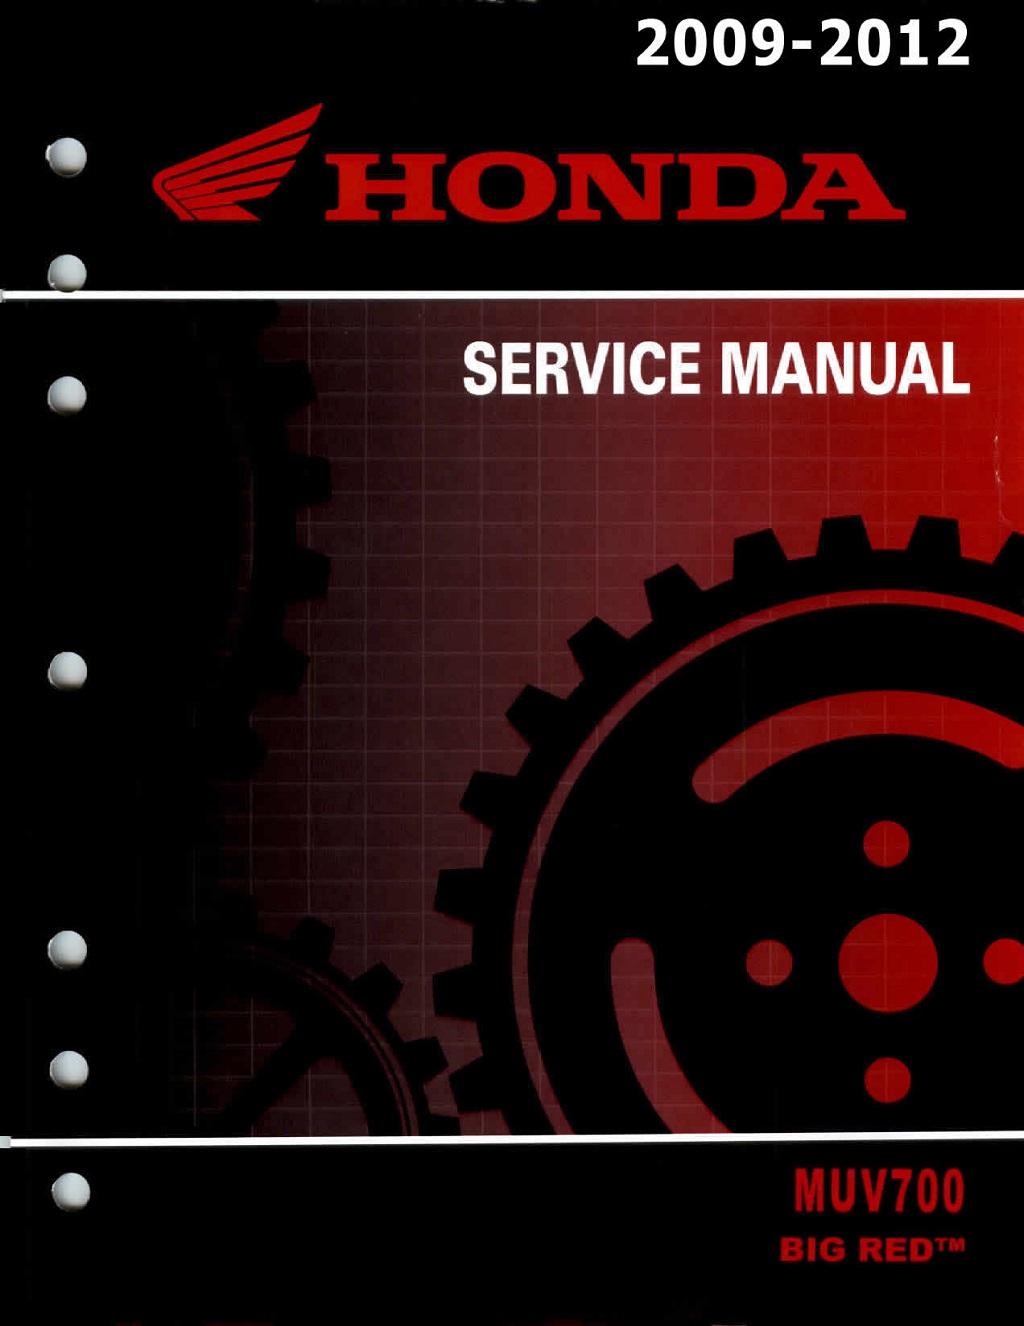 Workshop Manual for Honda MUV700 Big Red (2009-2012)